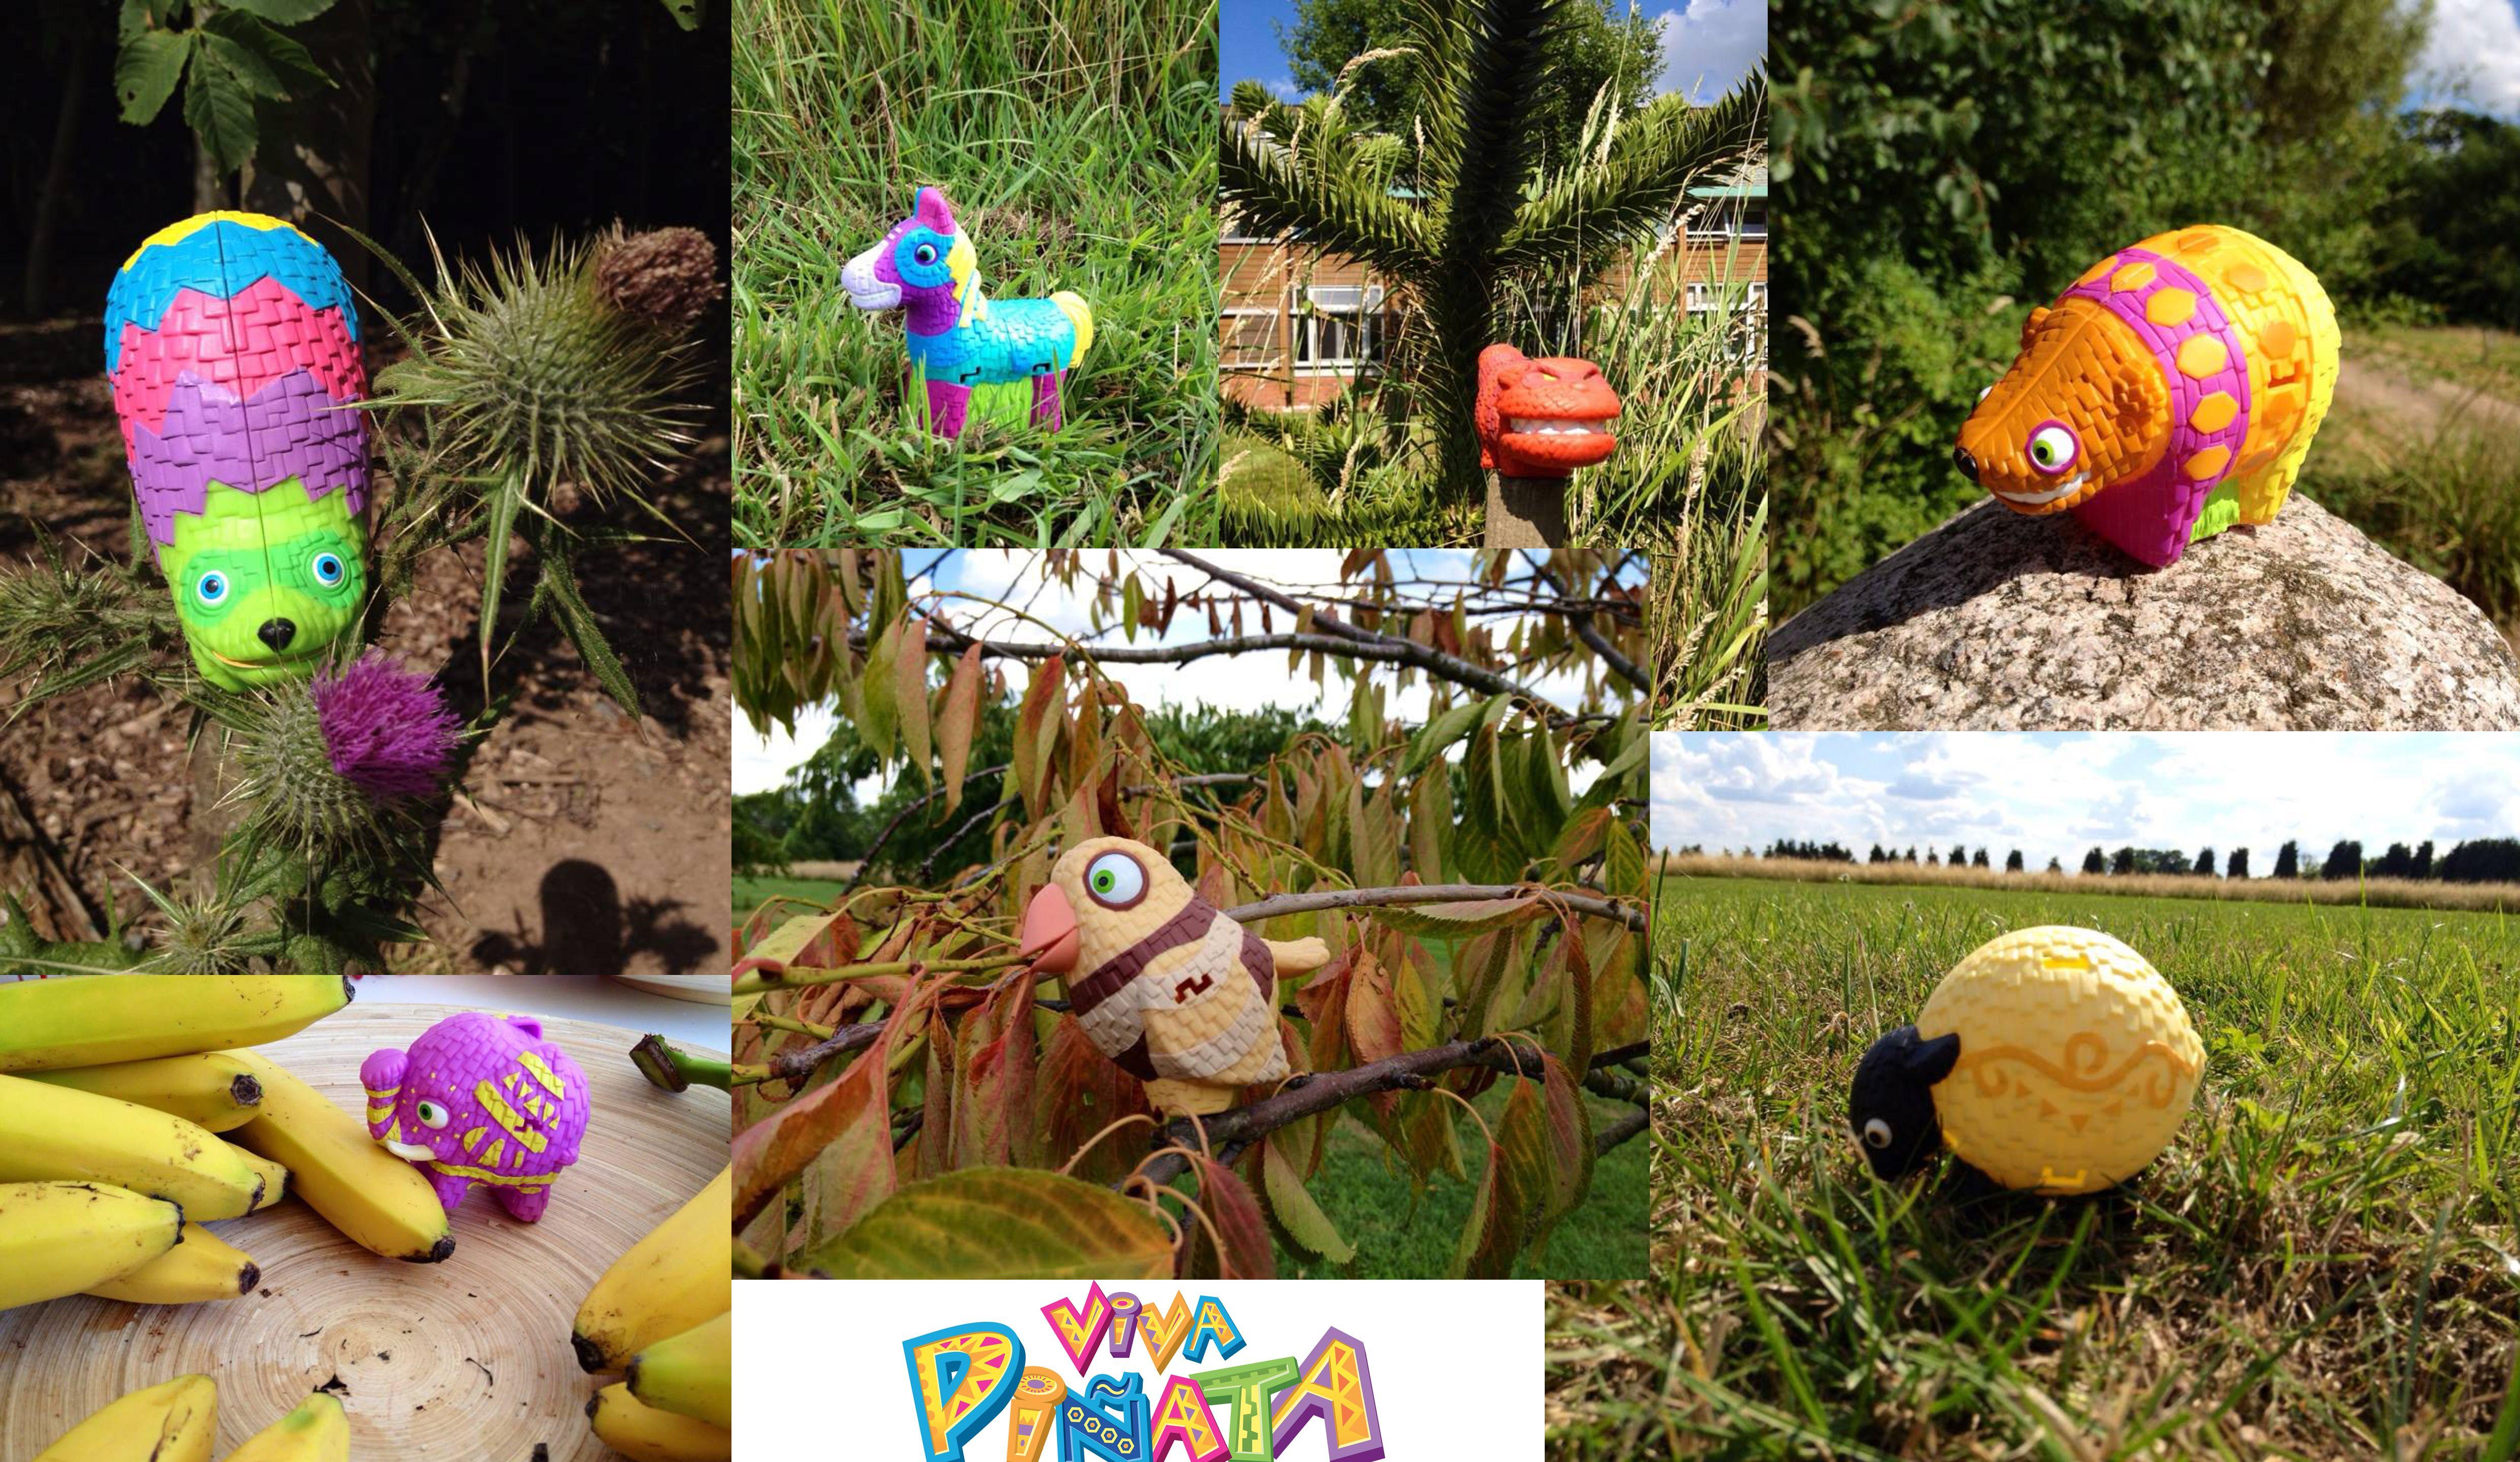 Viva Piñata Burger King toys shot in the Rare grounds   Viva